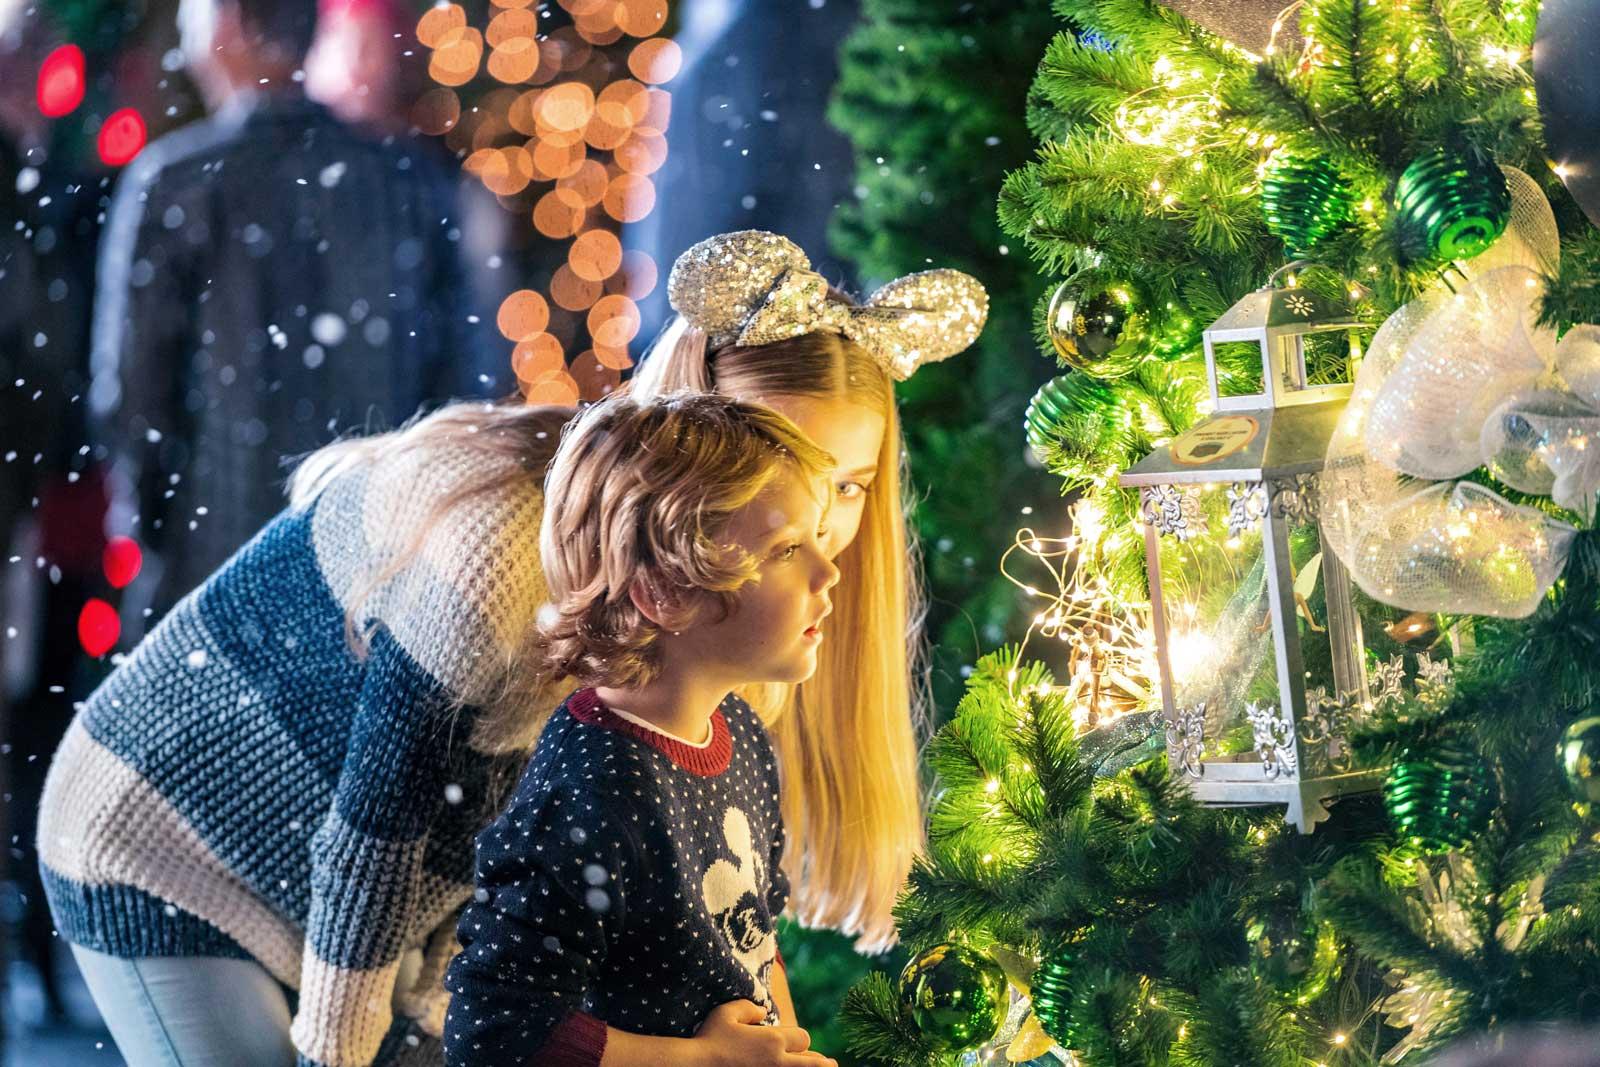 Disney_Christmas_tree_kid_1600px